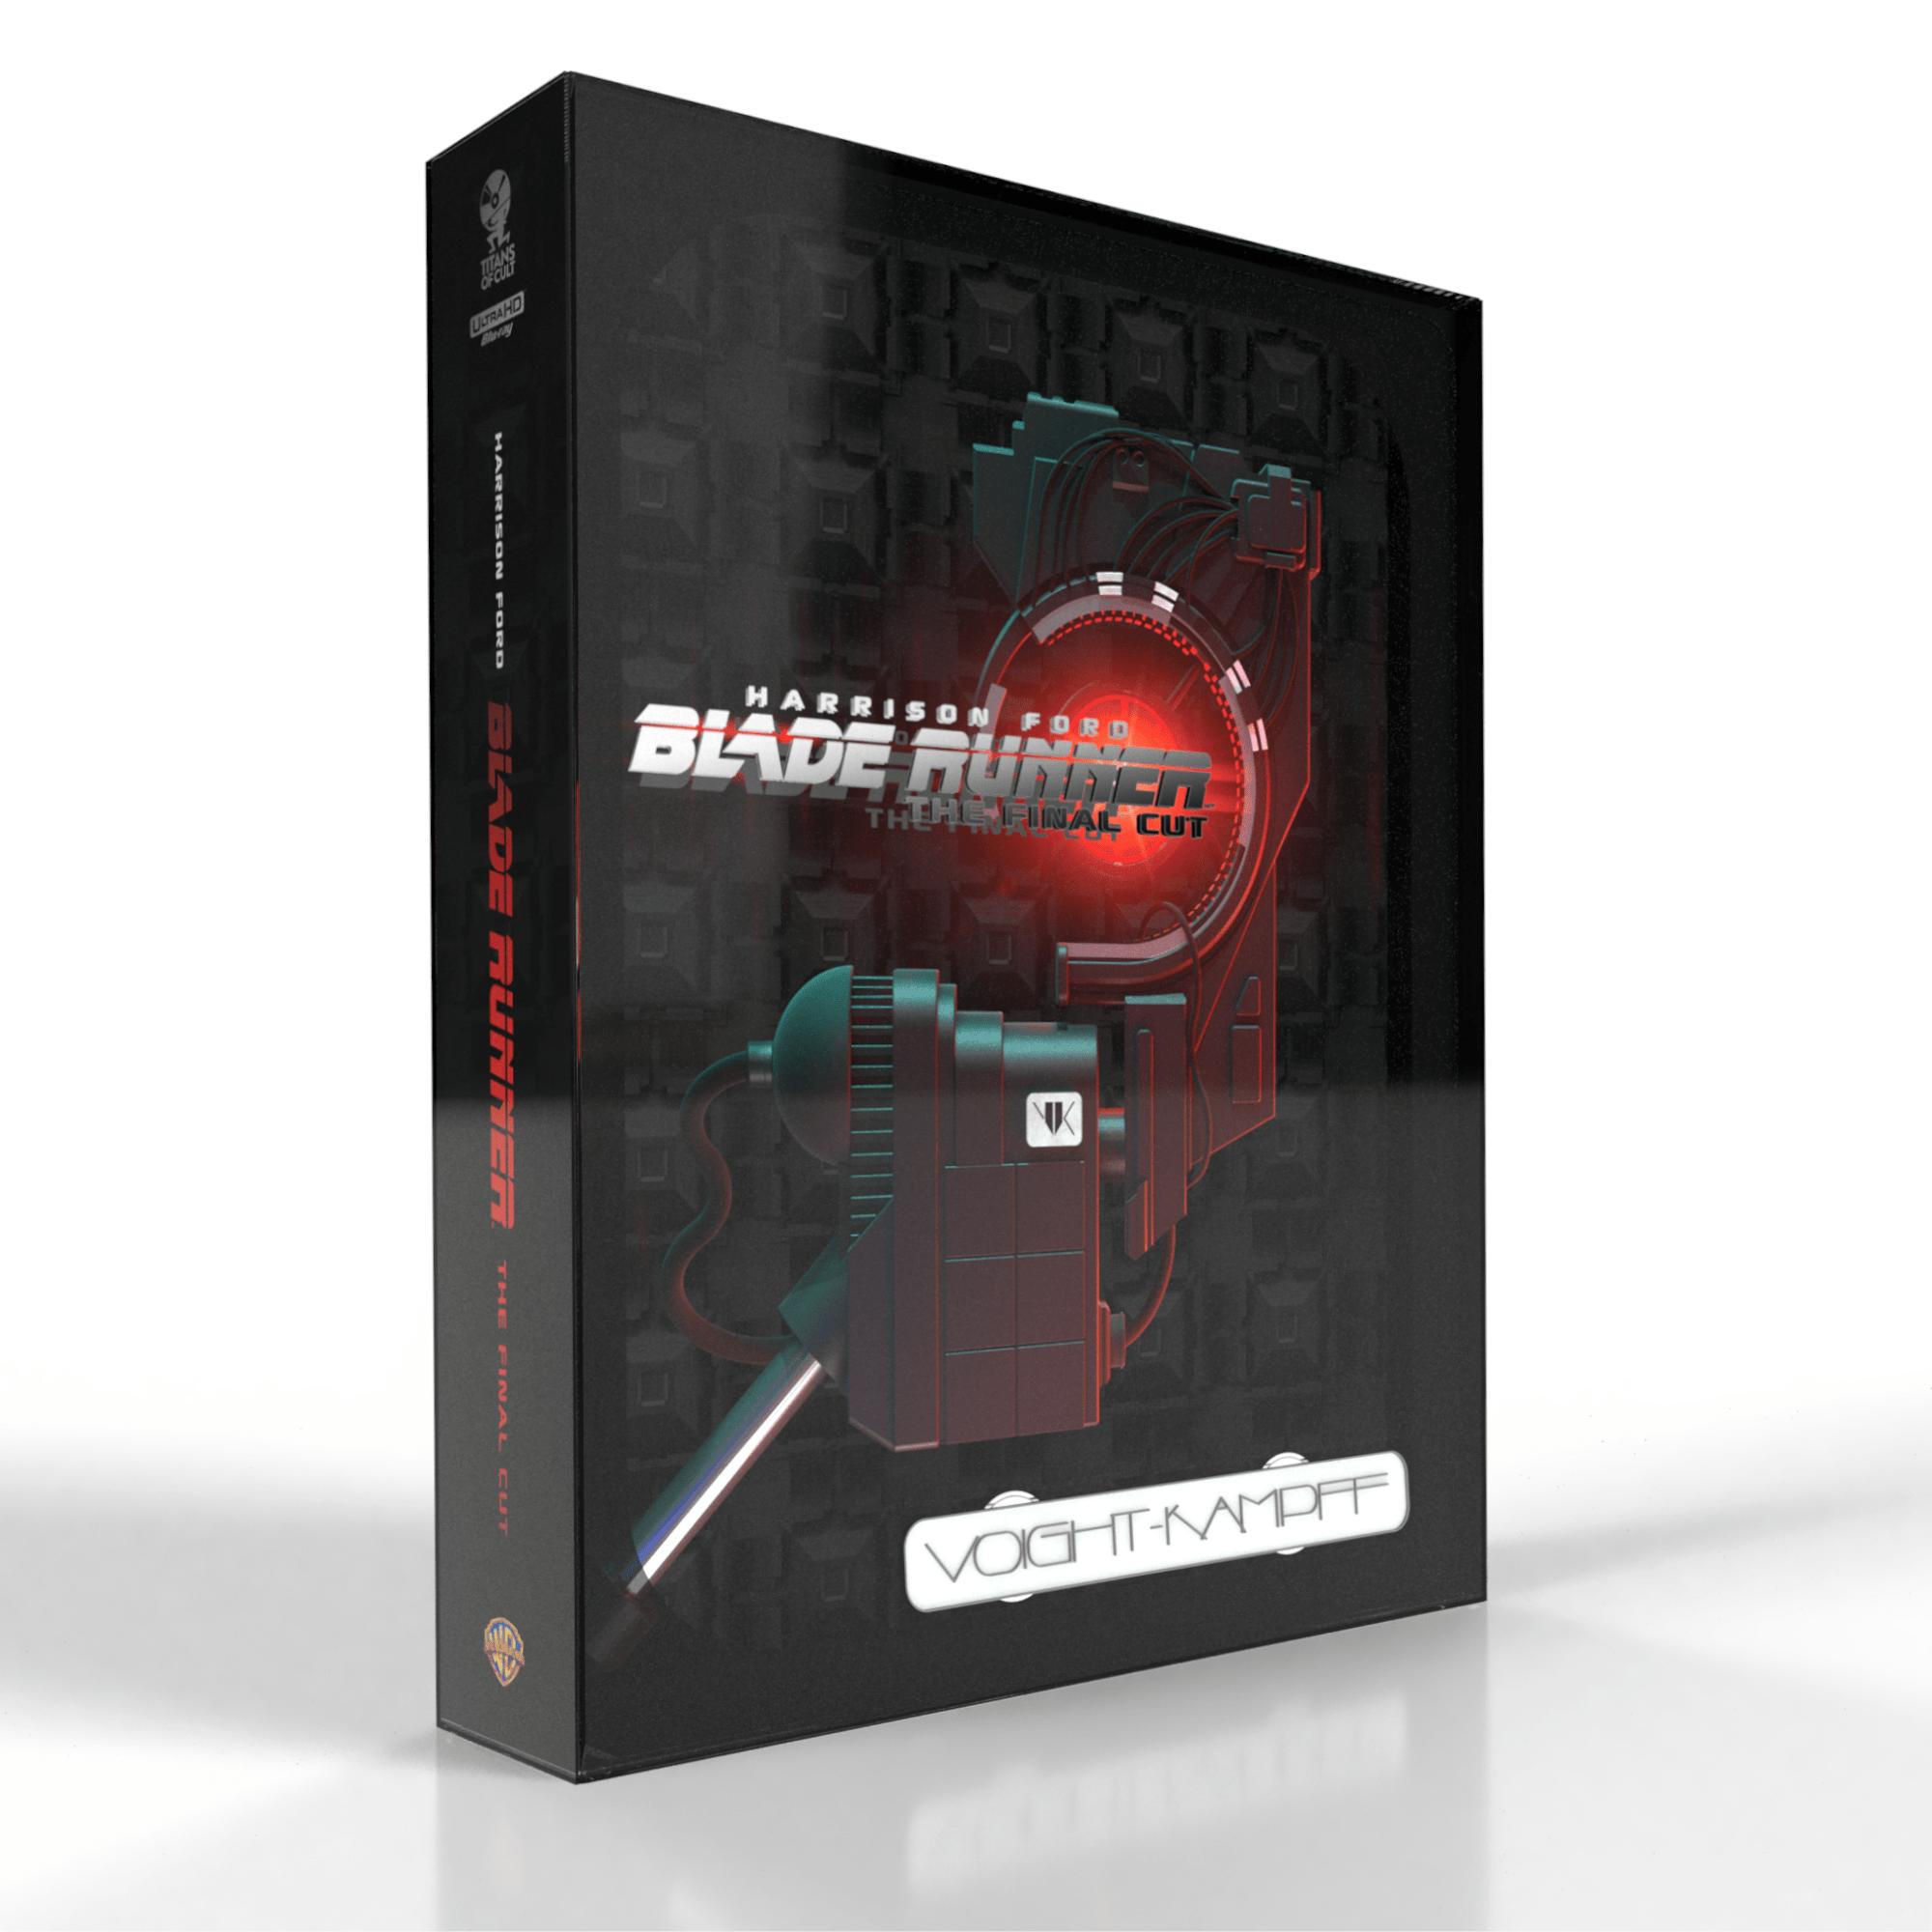 Blade Runner: la steelbook di Titans of Cult